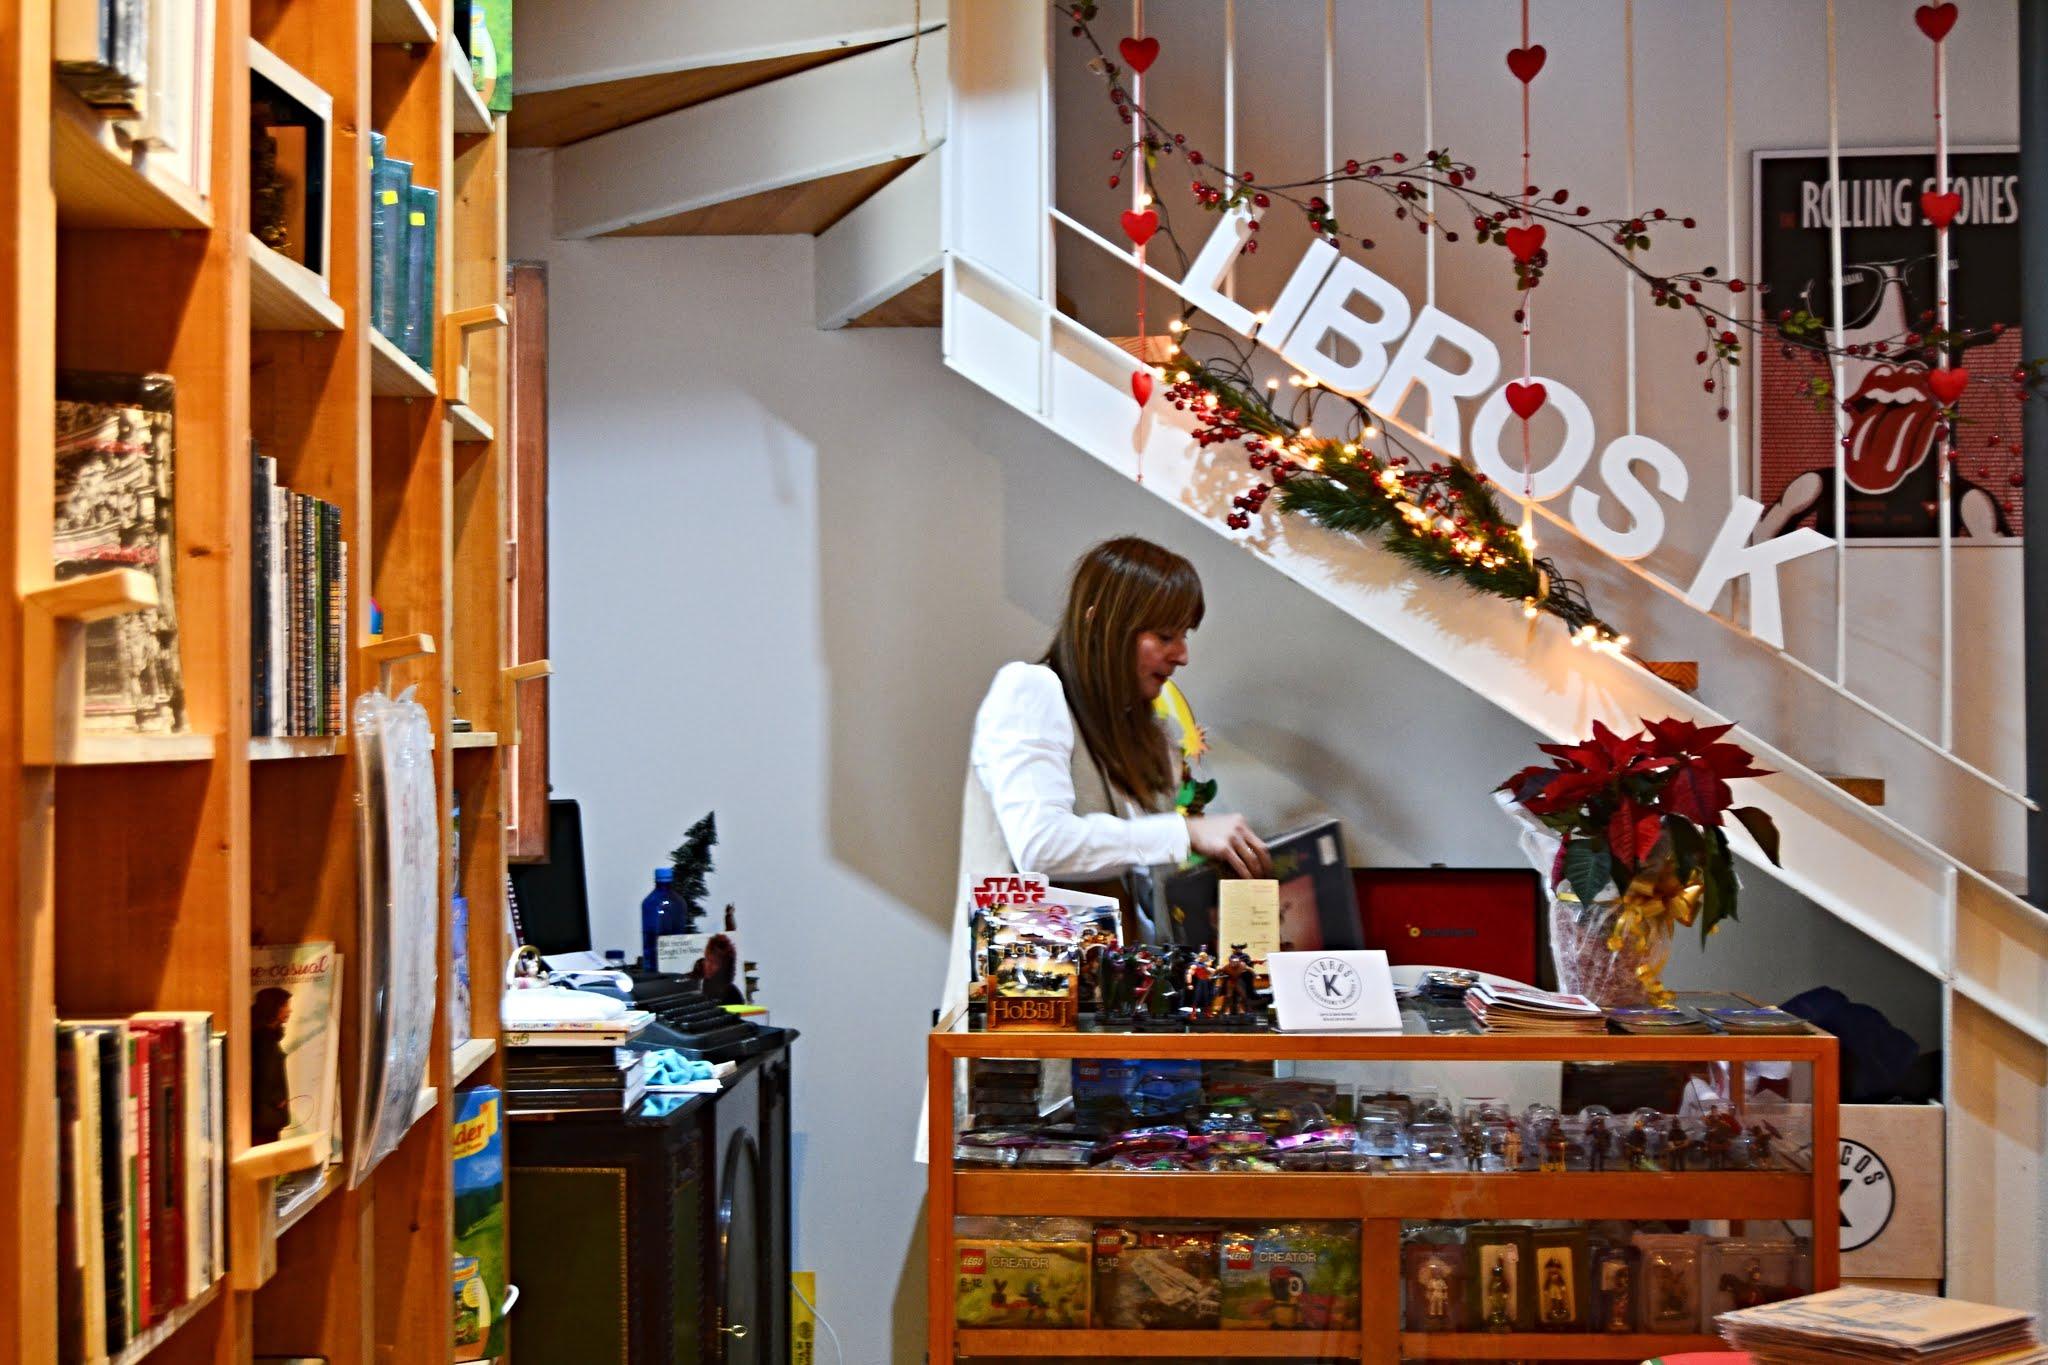 URUEÑA_VILLA_LIBRO_7_libreria